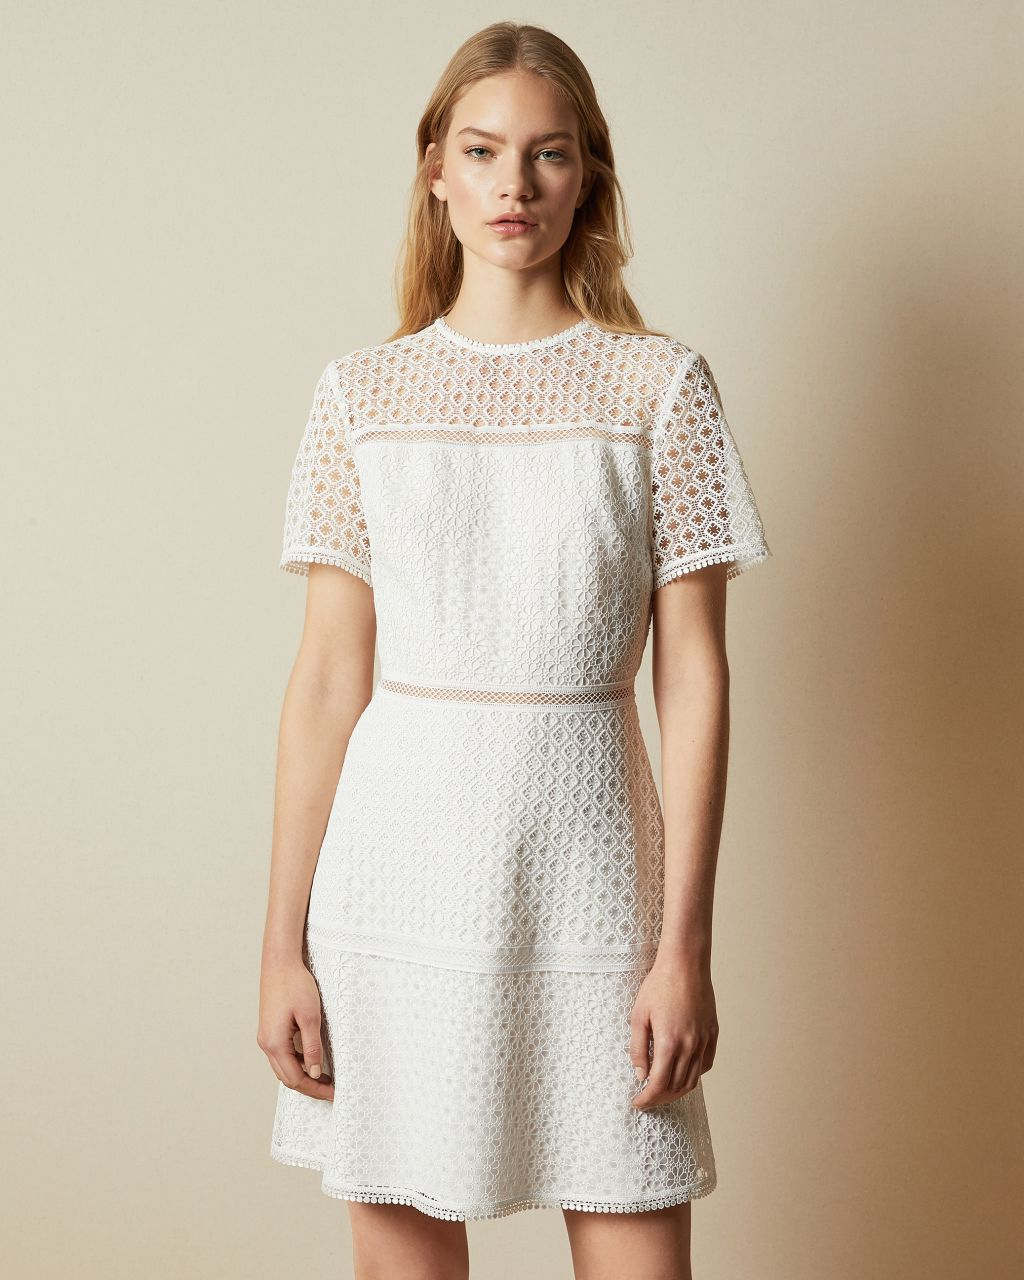 Short Sleeved Lace Mini Dress